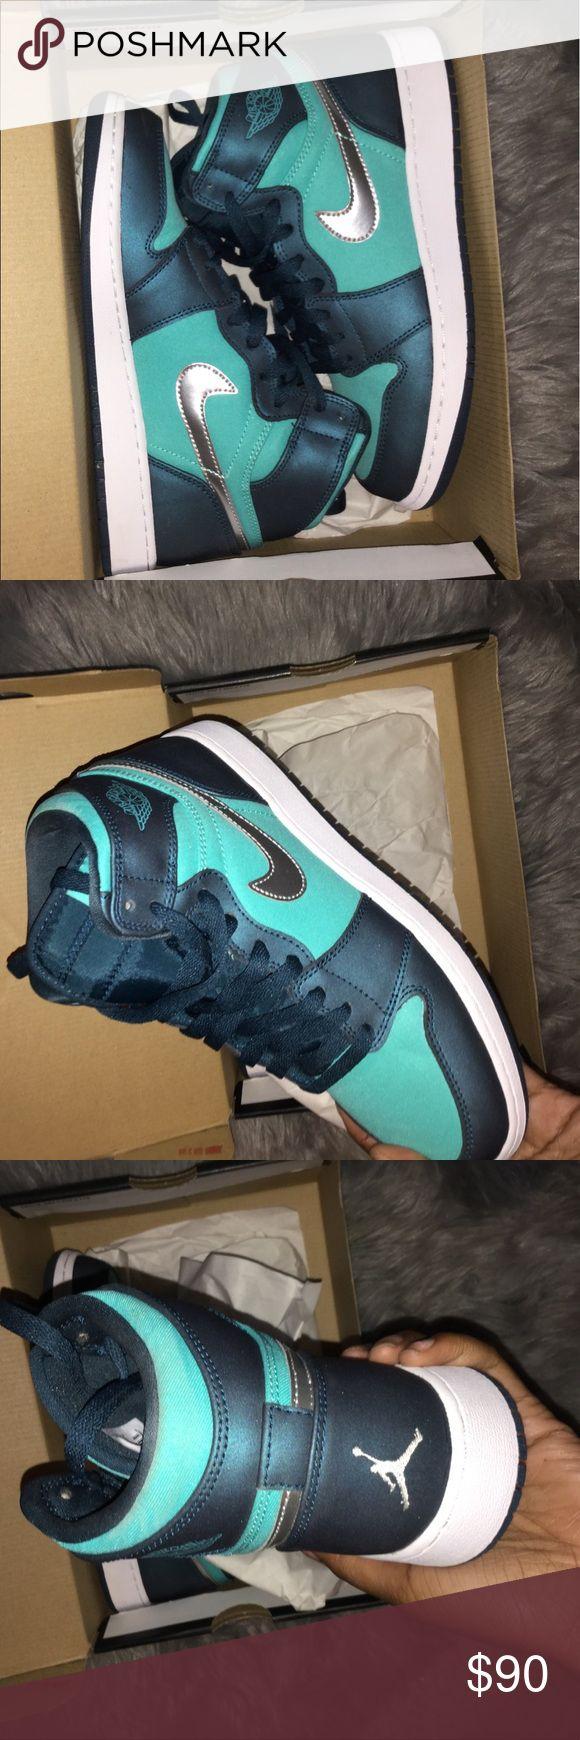 Jordan 1 retro ones Girls Blue and teal Jordan retro ones Never worn!! Air Jordan Shoes Athletic Shoes